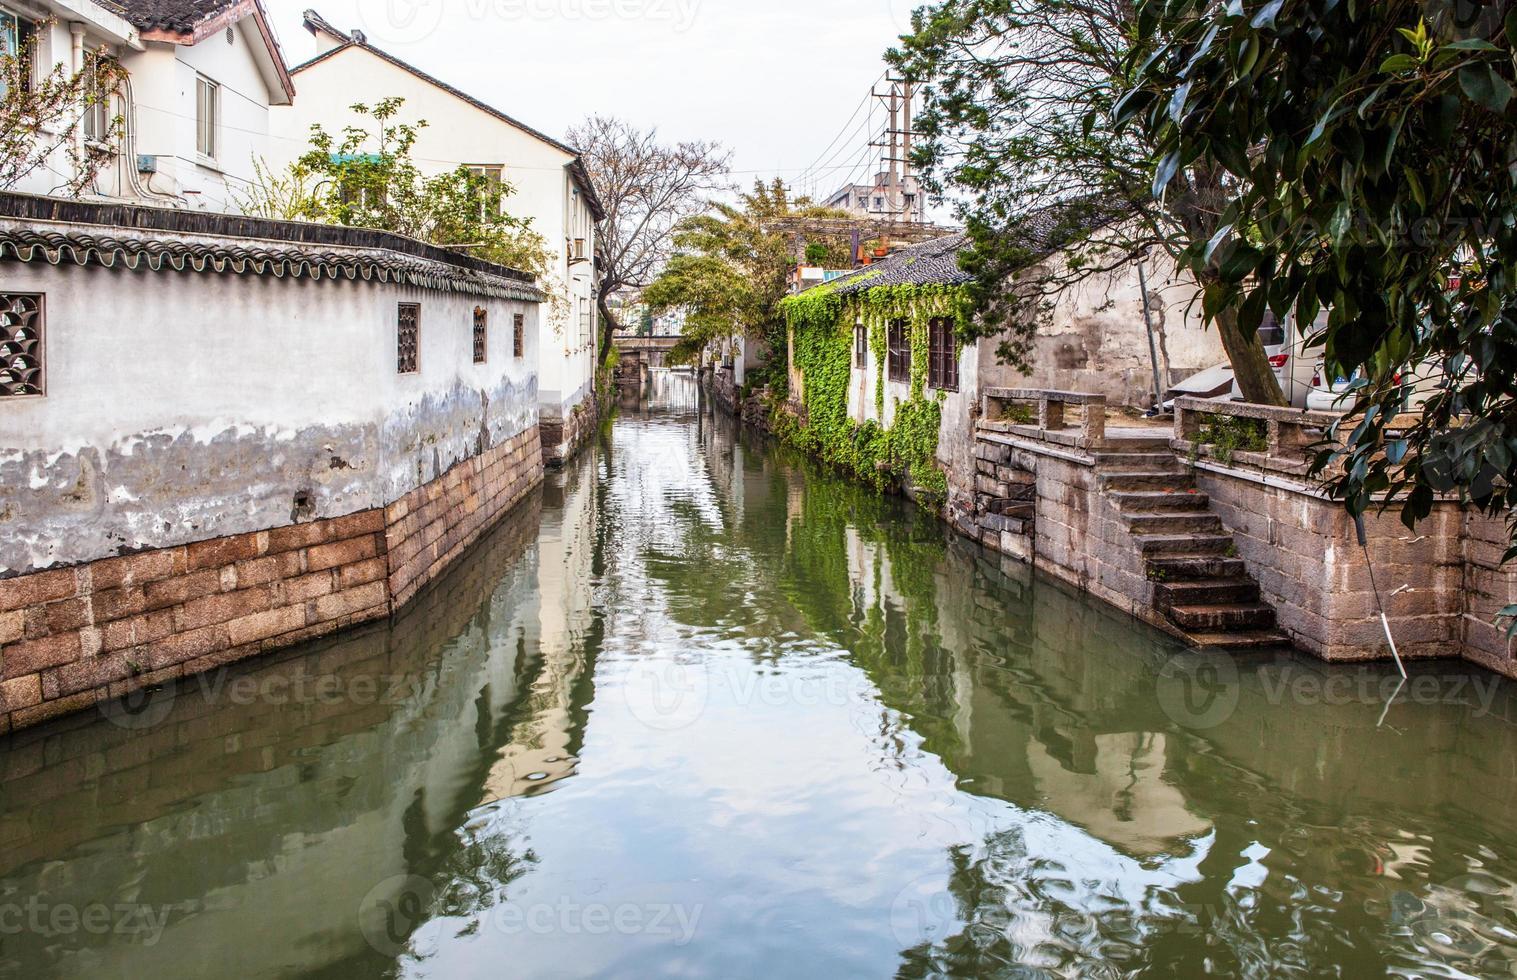 casas e canais folclóricos de suzhou foto